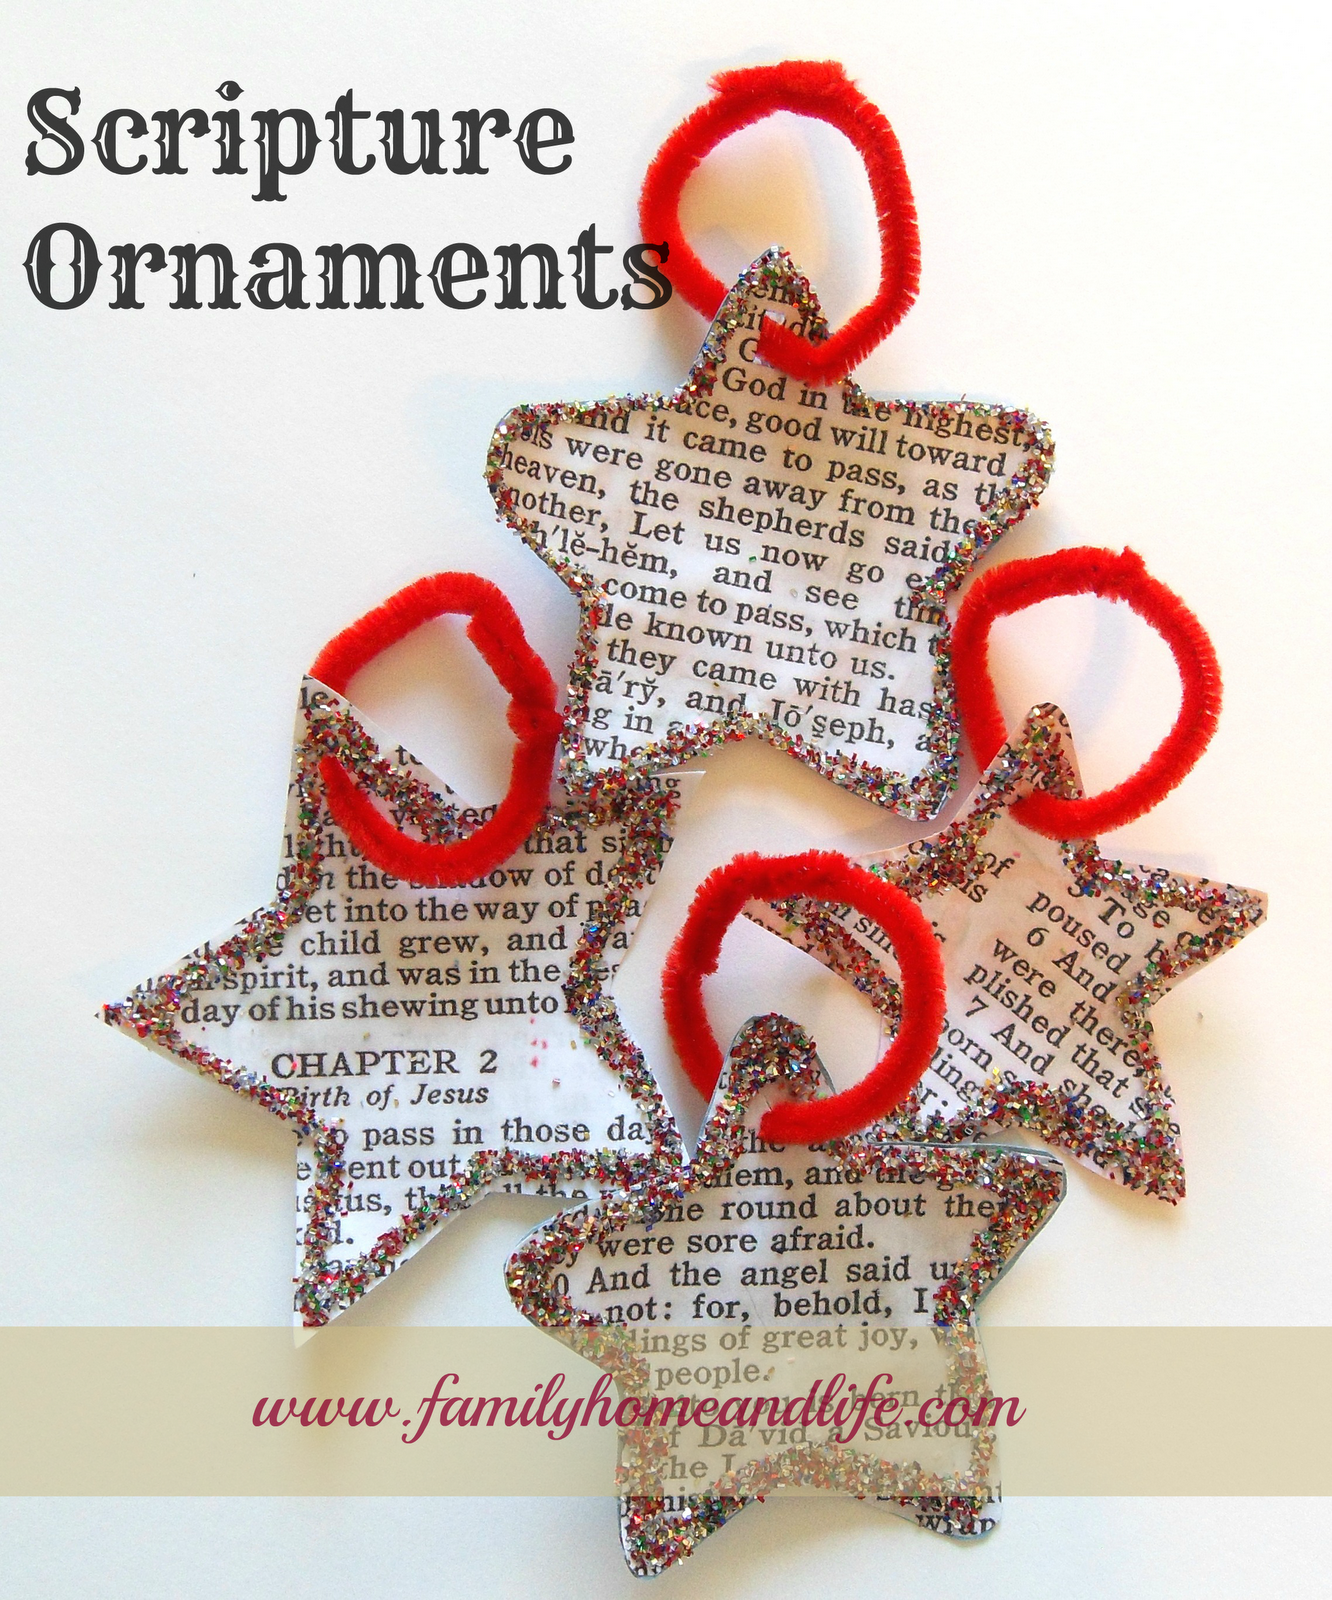 Scripture Ornaments Use Bible Program Like Esword Or